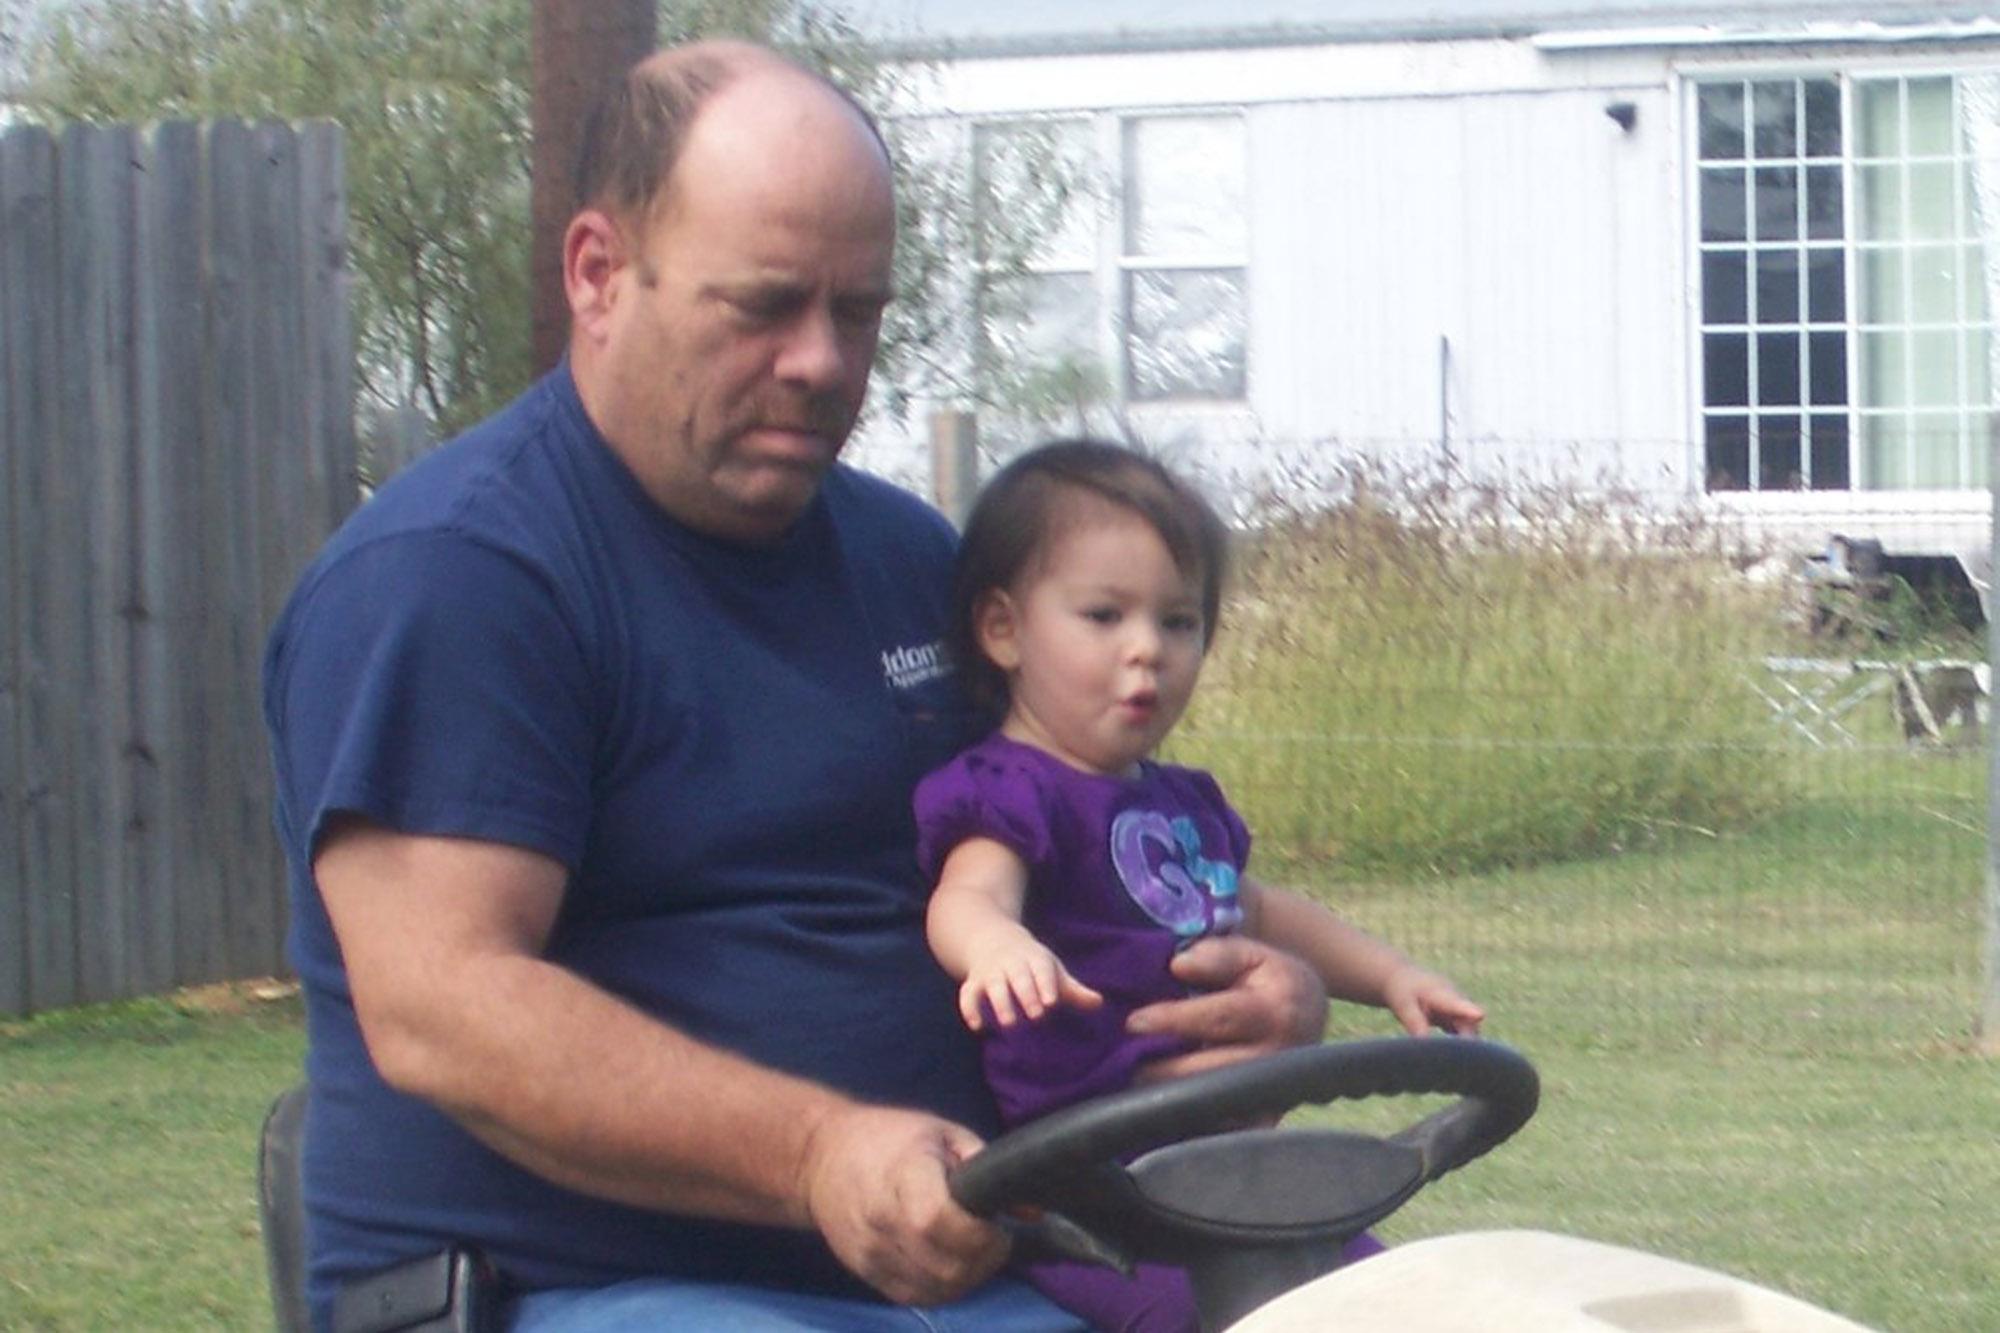 Leukemia-stricken Texas chief who led COVID-19 efforts dies